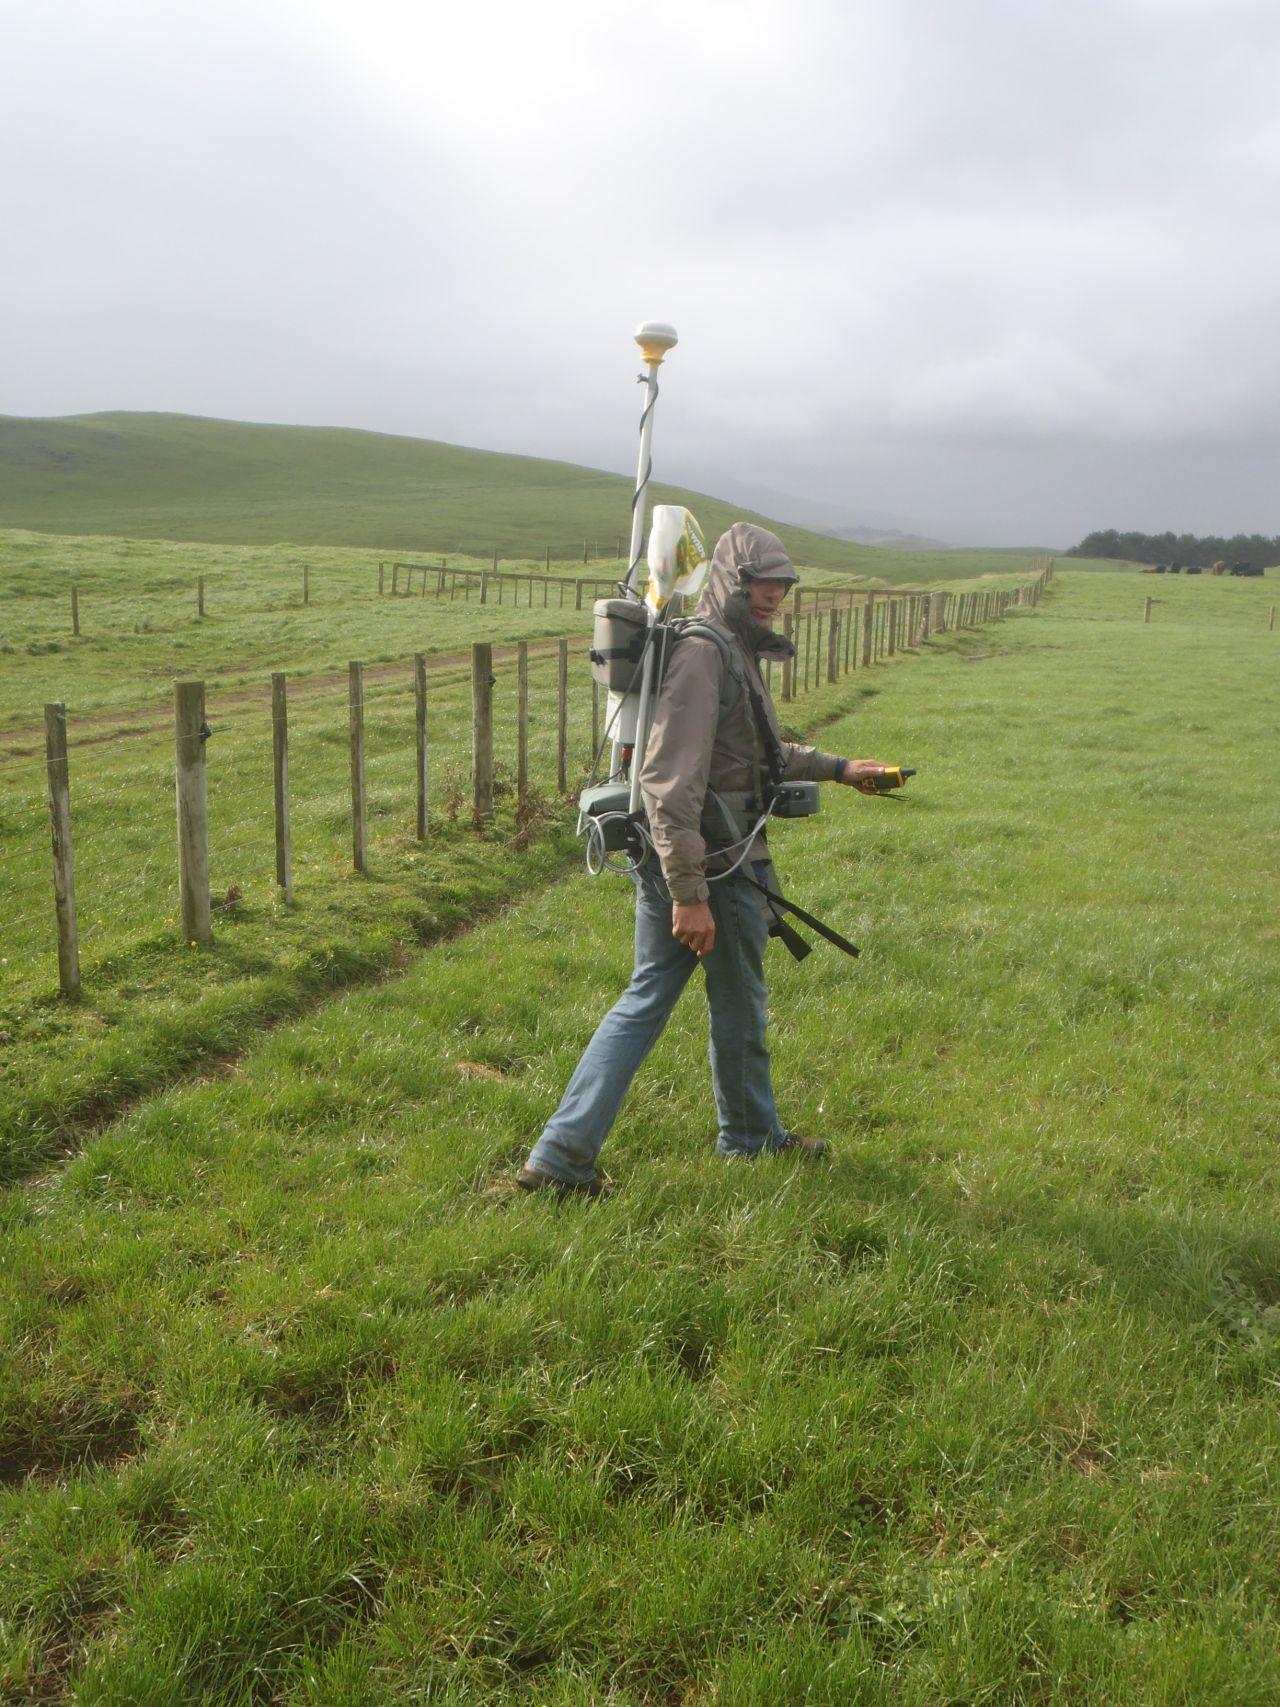 Ground magnetic surveying